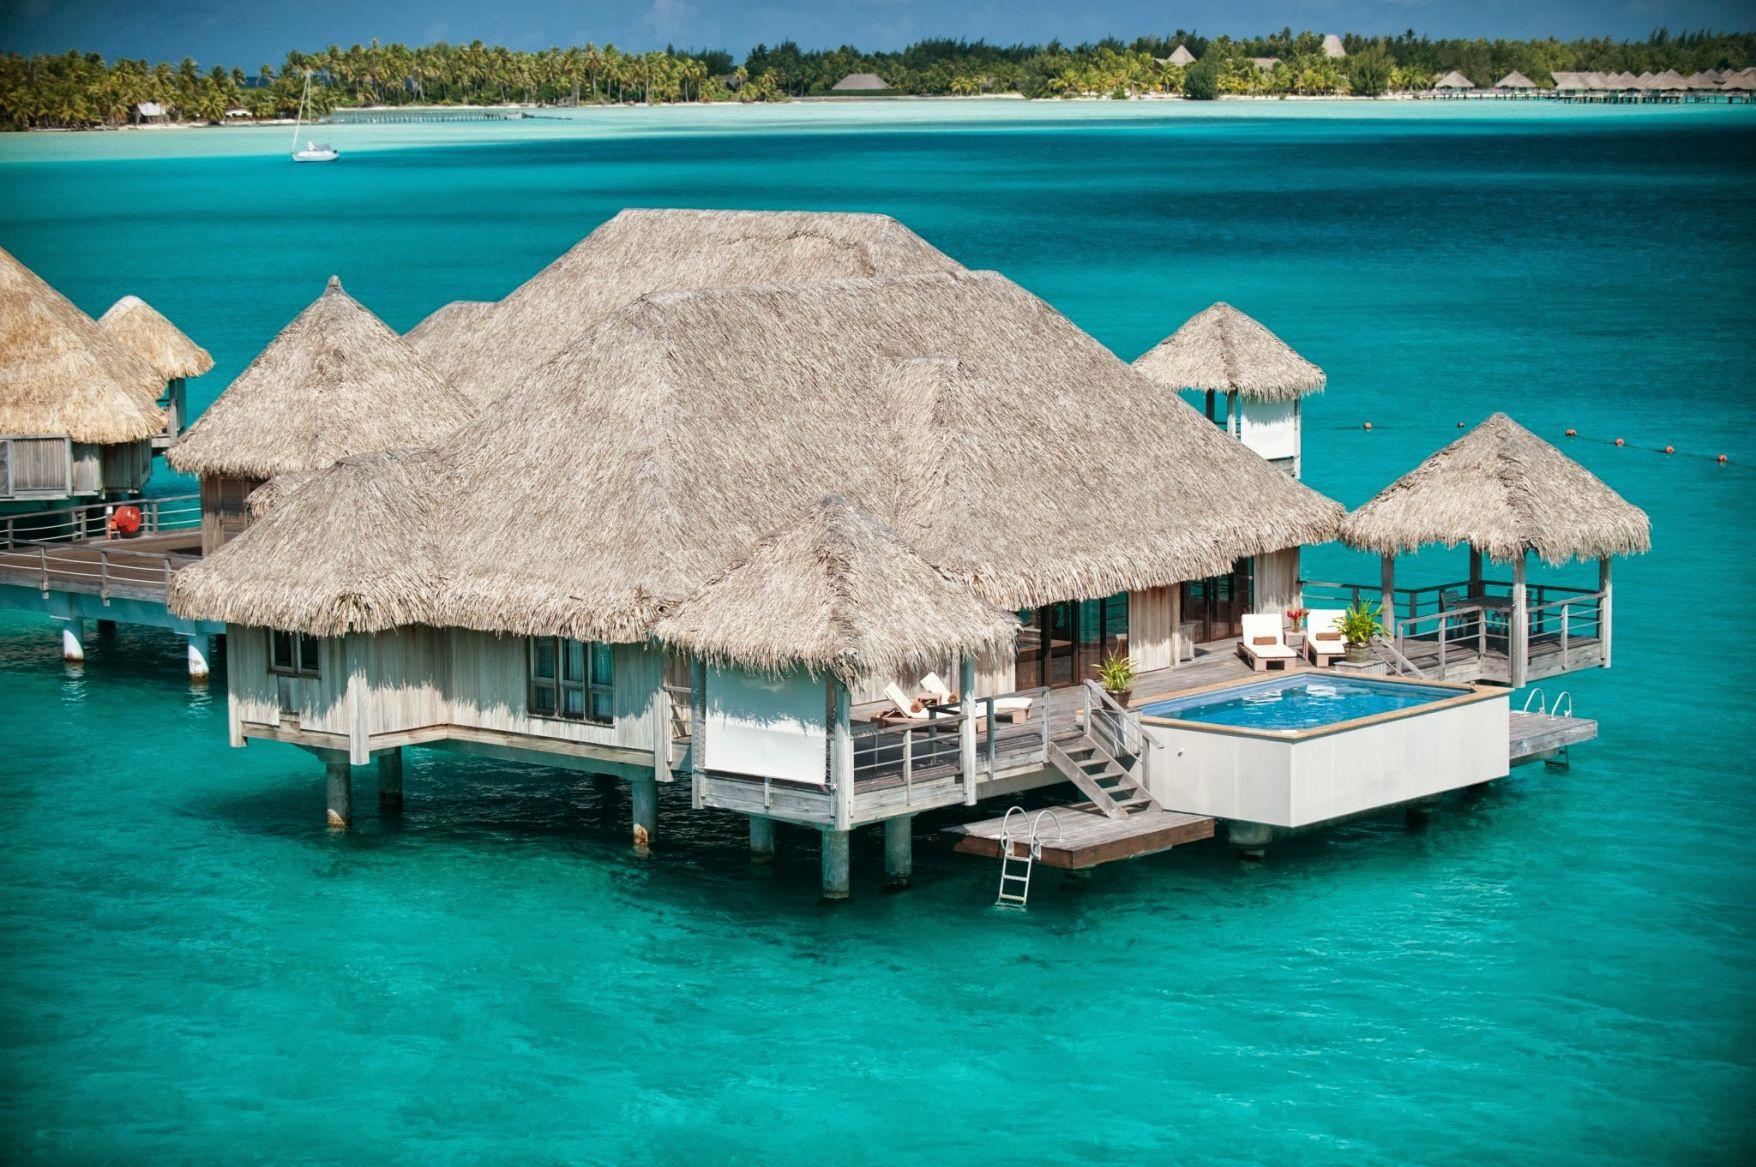 Inspirational All Inclusive Tahiti Vacations Overwater Bungalows - All inclusive tahiti vacations